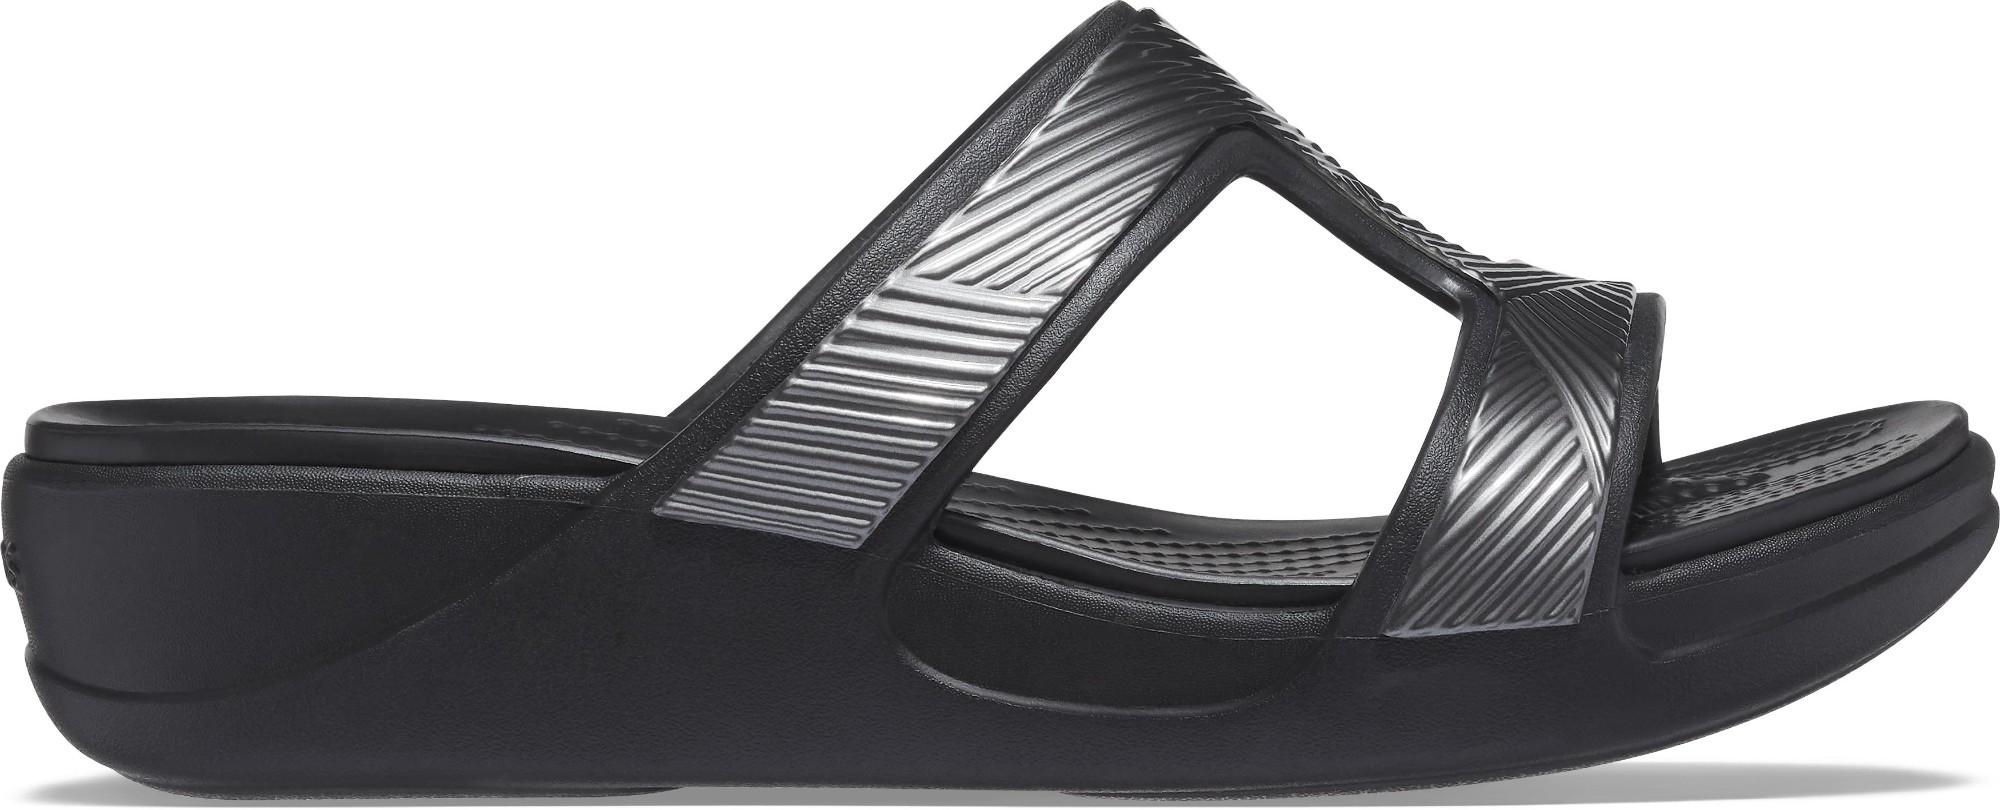 Crocs™ Monterey Metallic Slip-On Wedge Black 41